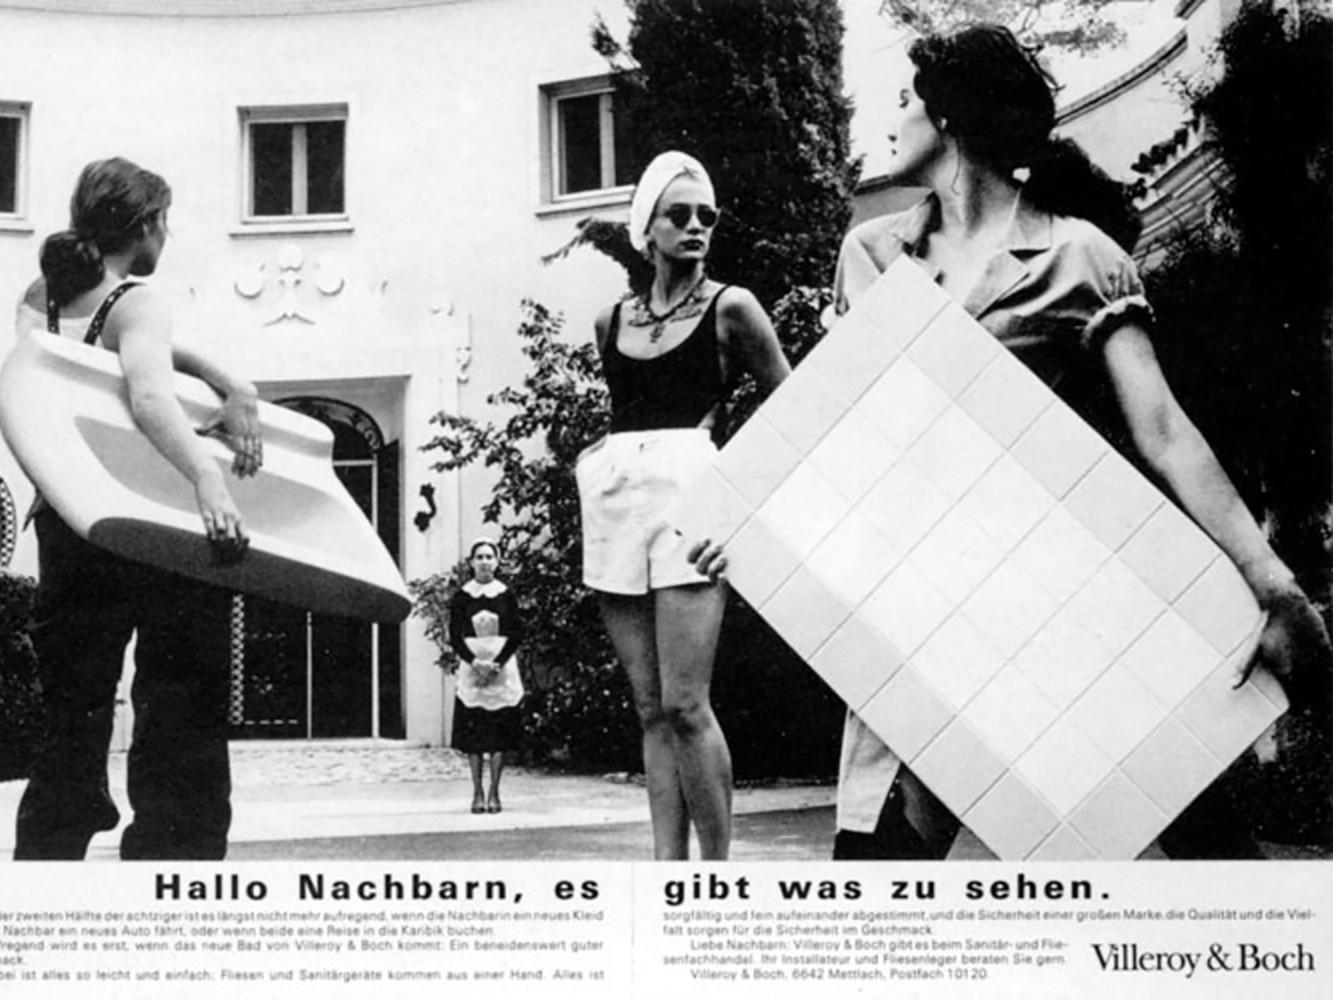 Villeroy & Boch - Hallo Nachbarn